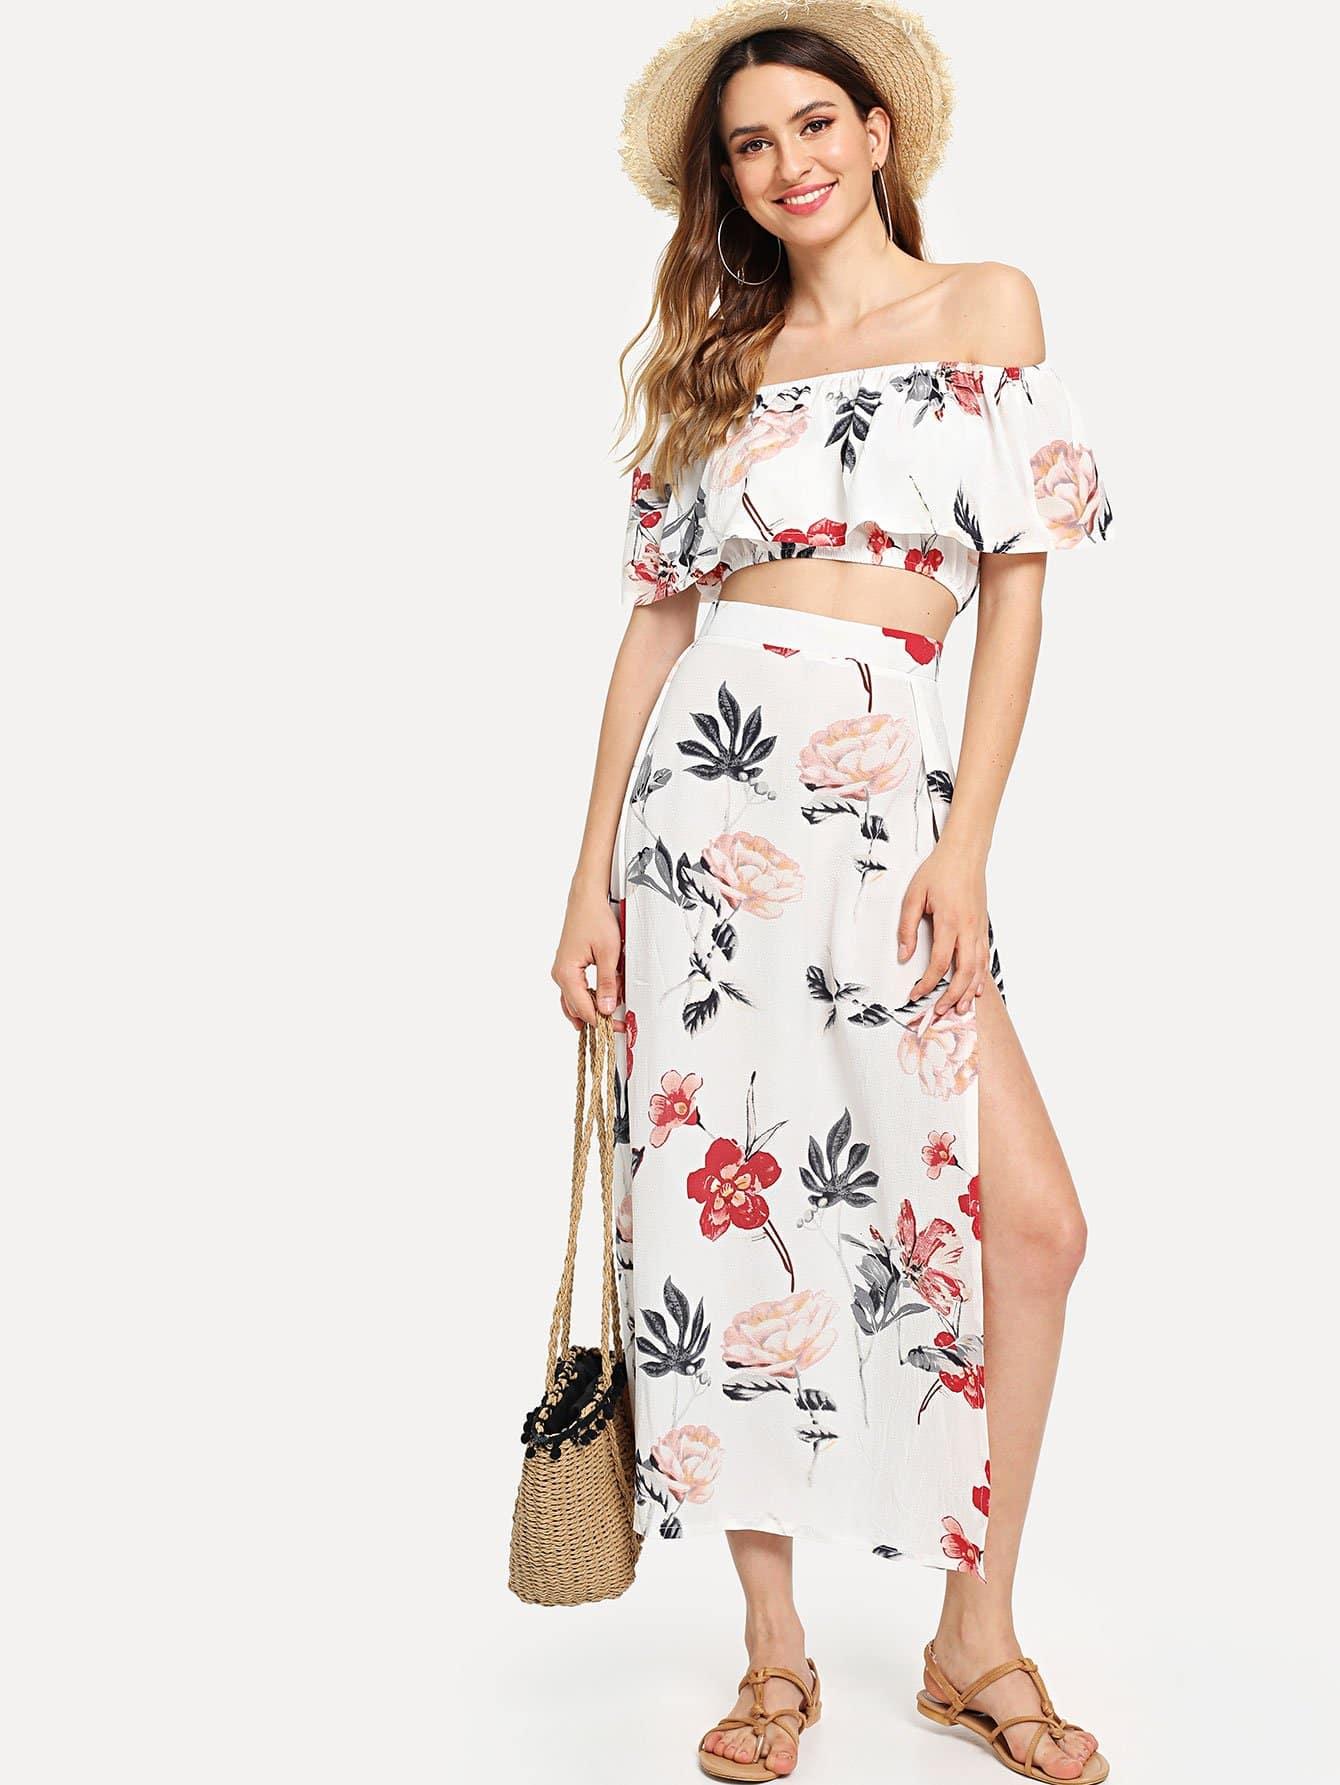 Bardot Floral Print Crop Top With Slit Side Skirt black choker sleeveless crop top